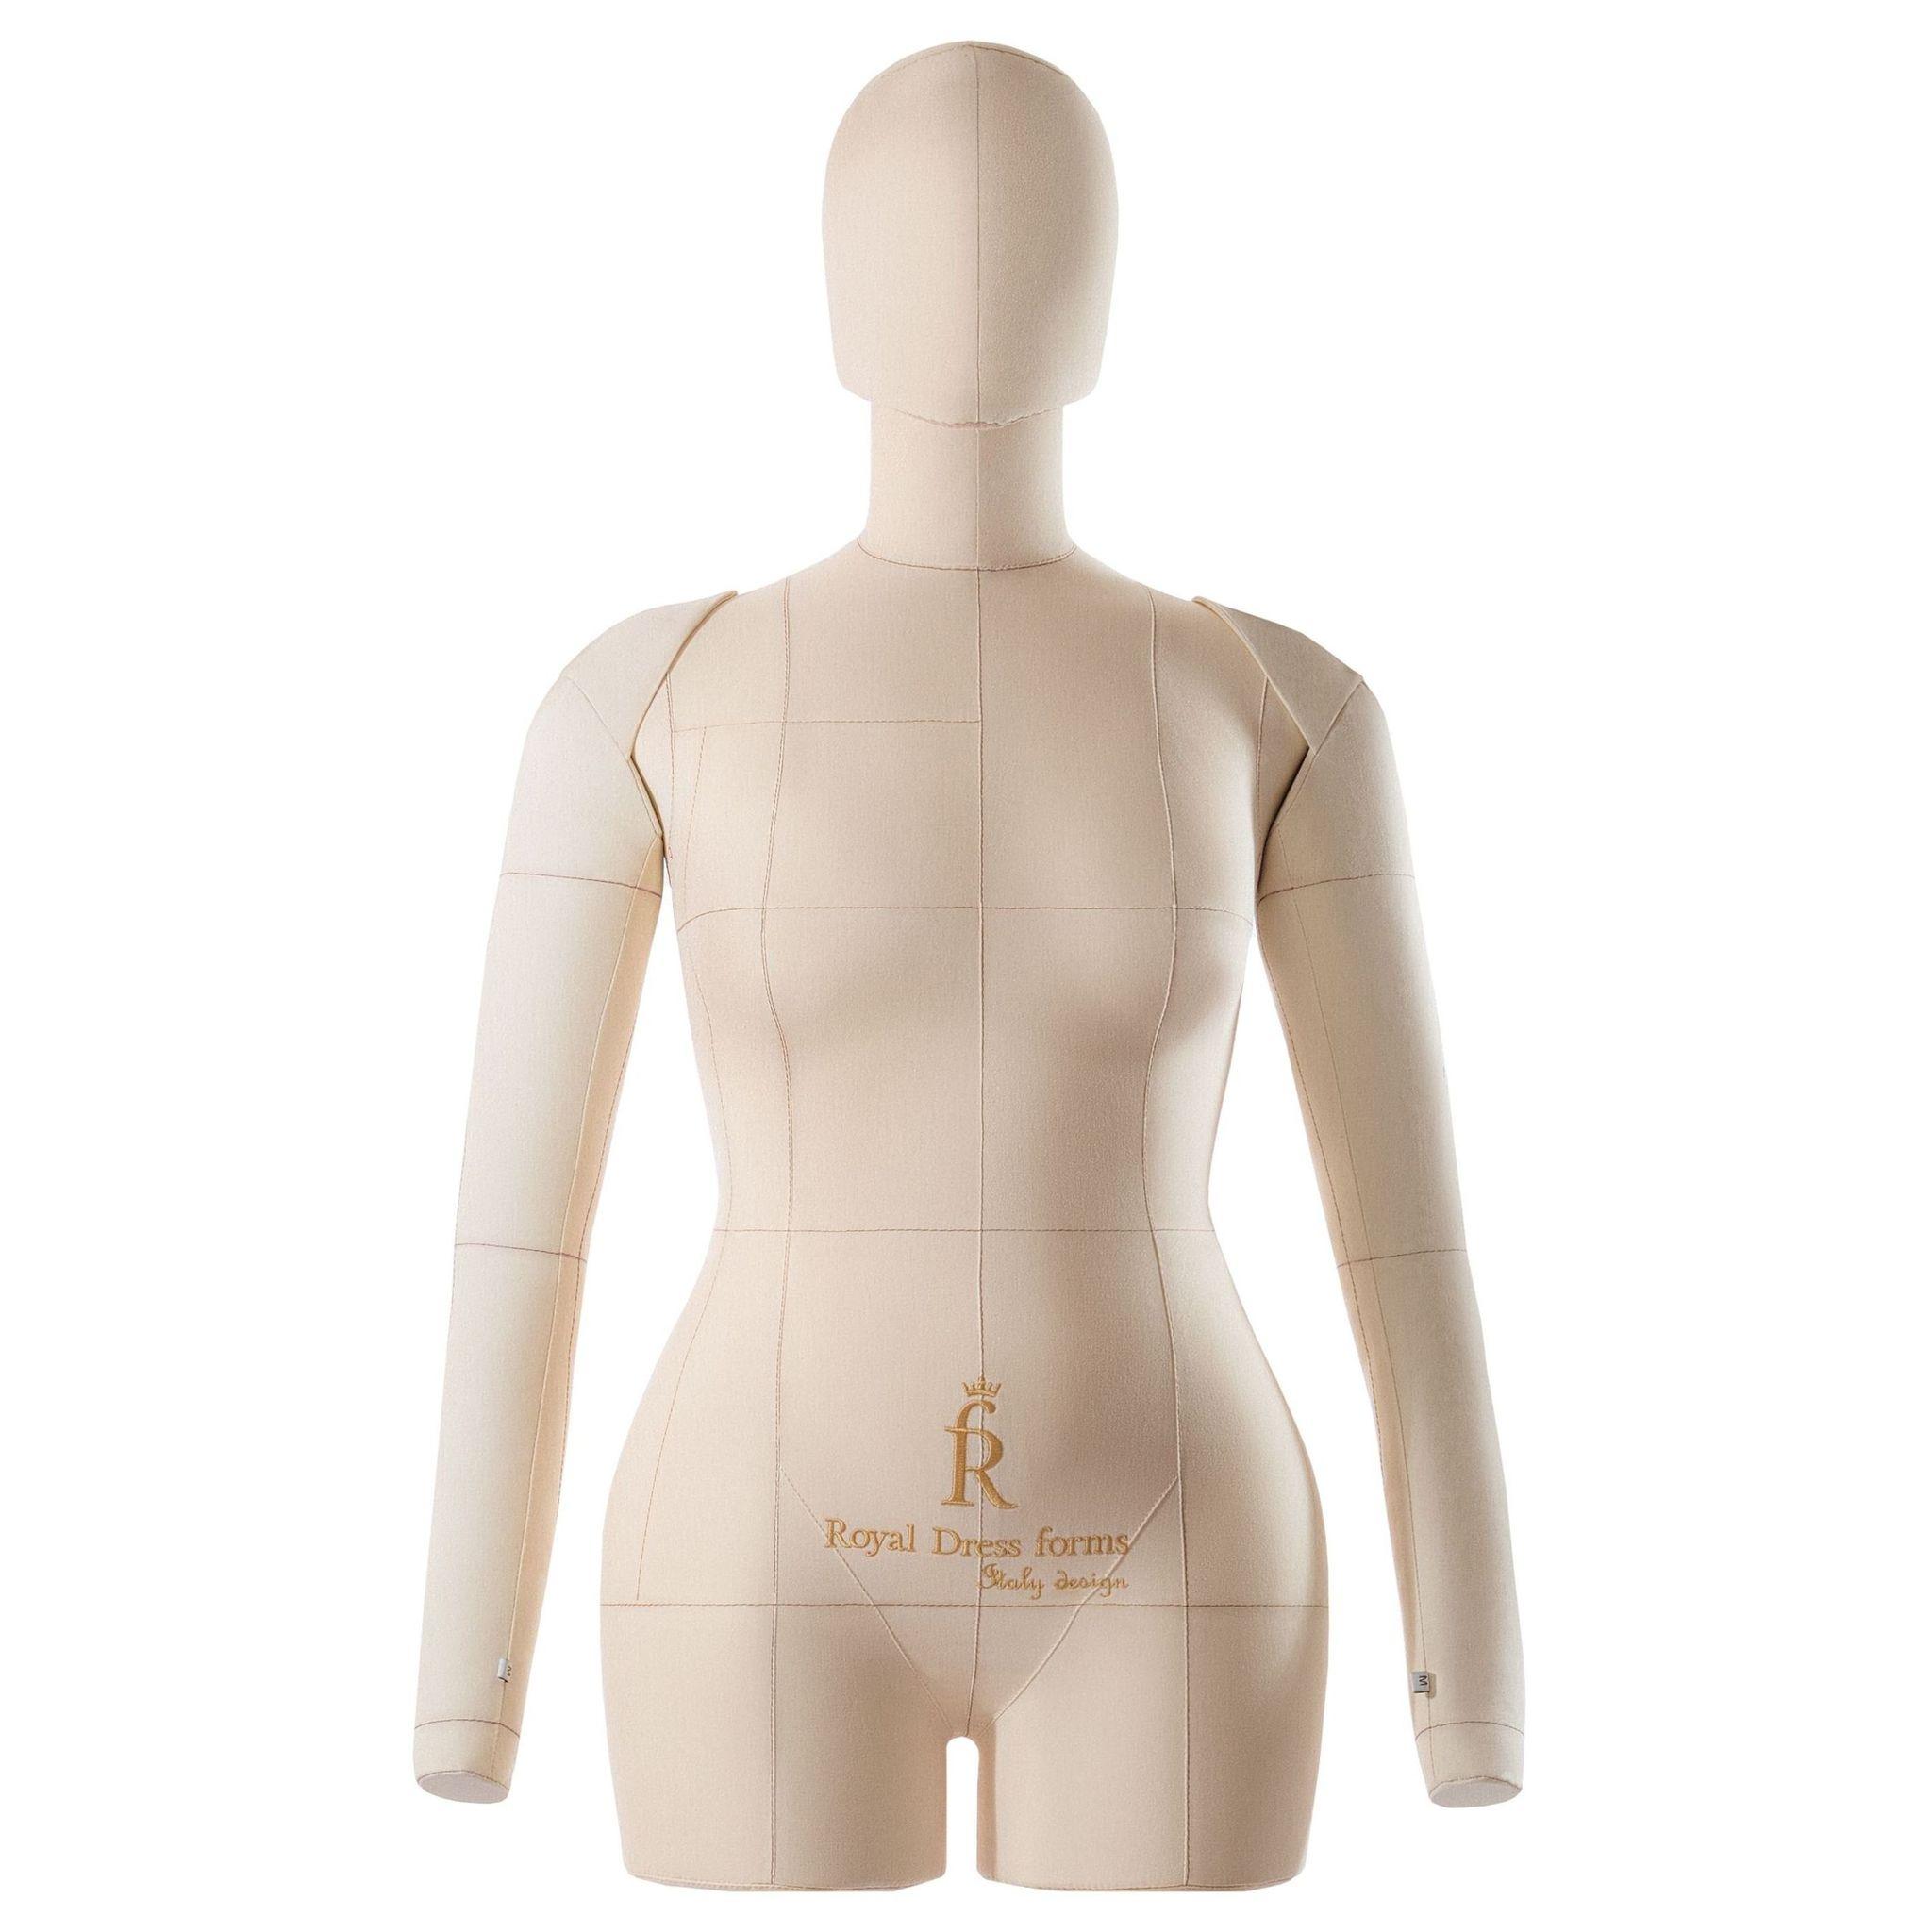 Комплект Lux: мягкий манекен Monica бежевый 46, Ручки, Голова, Фиксатор, Сумка